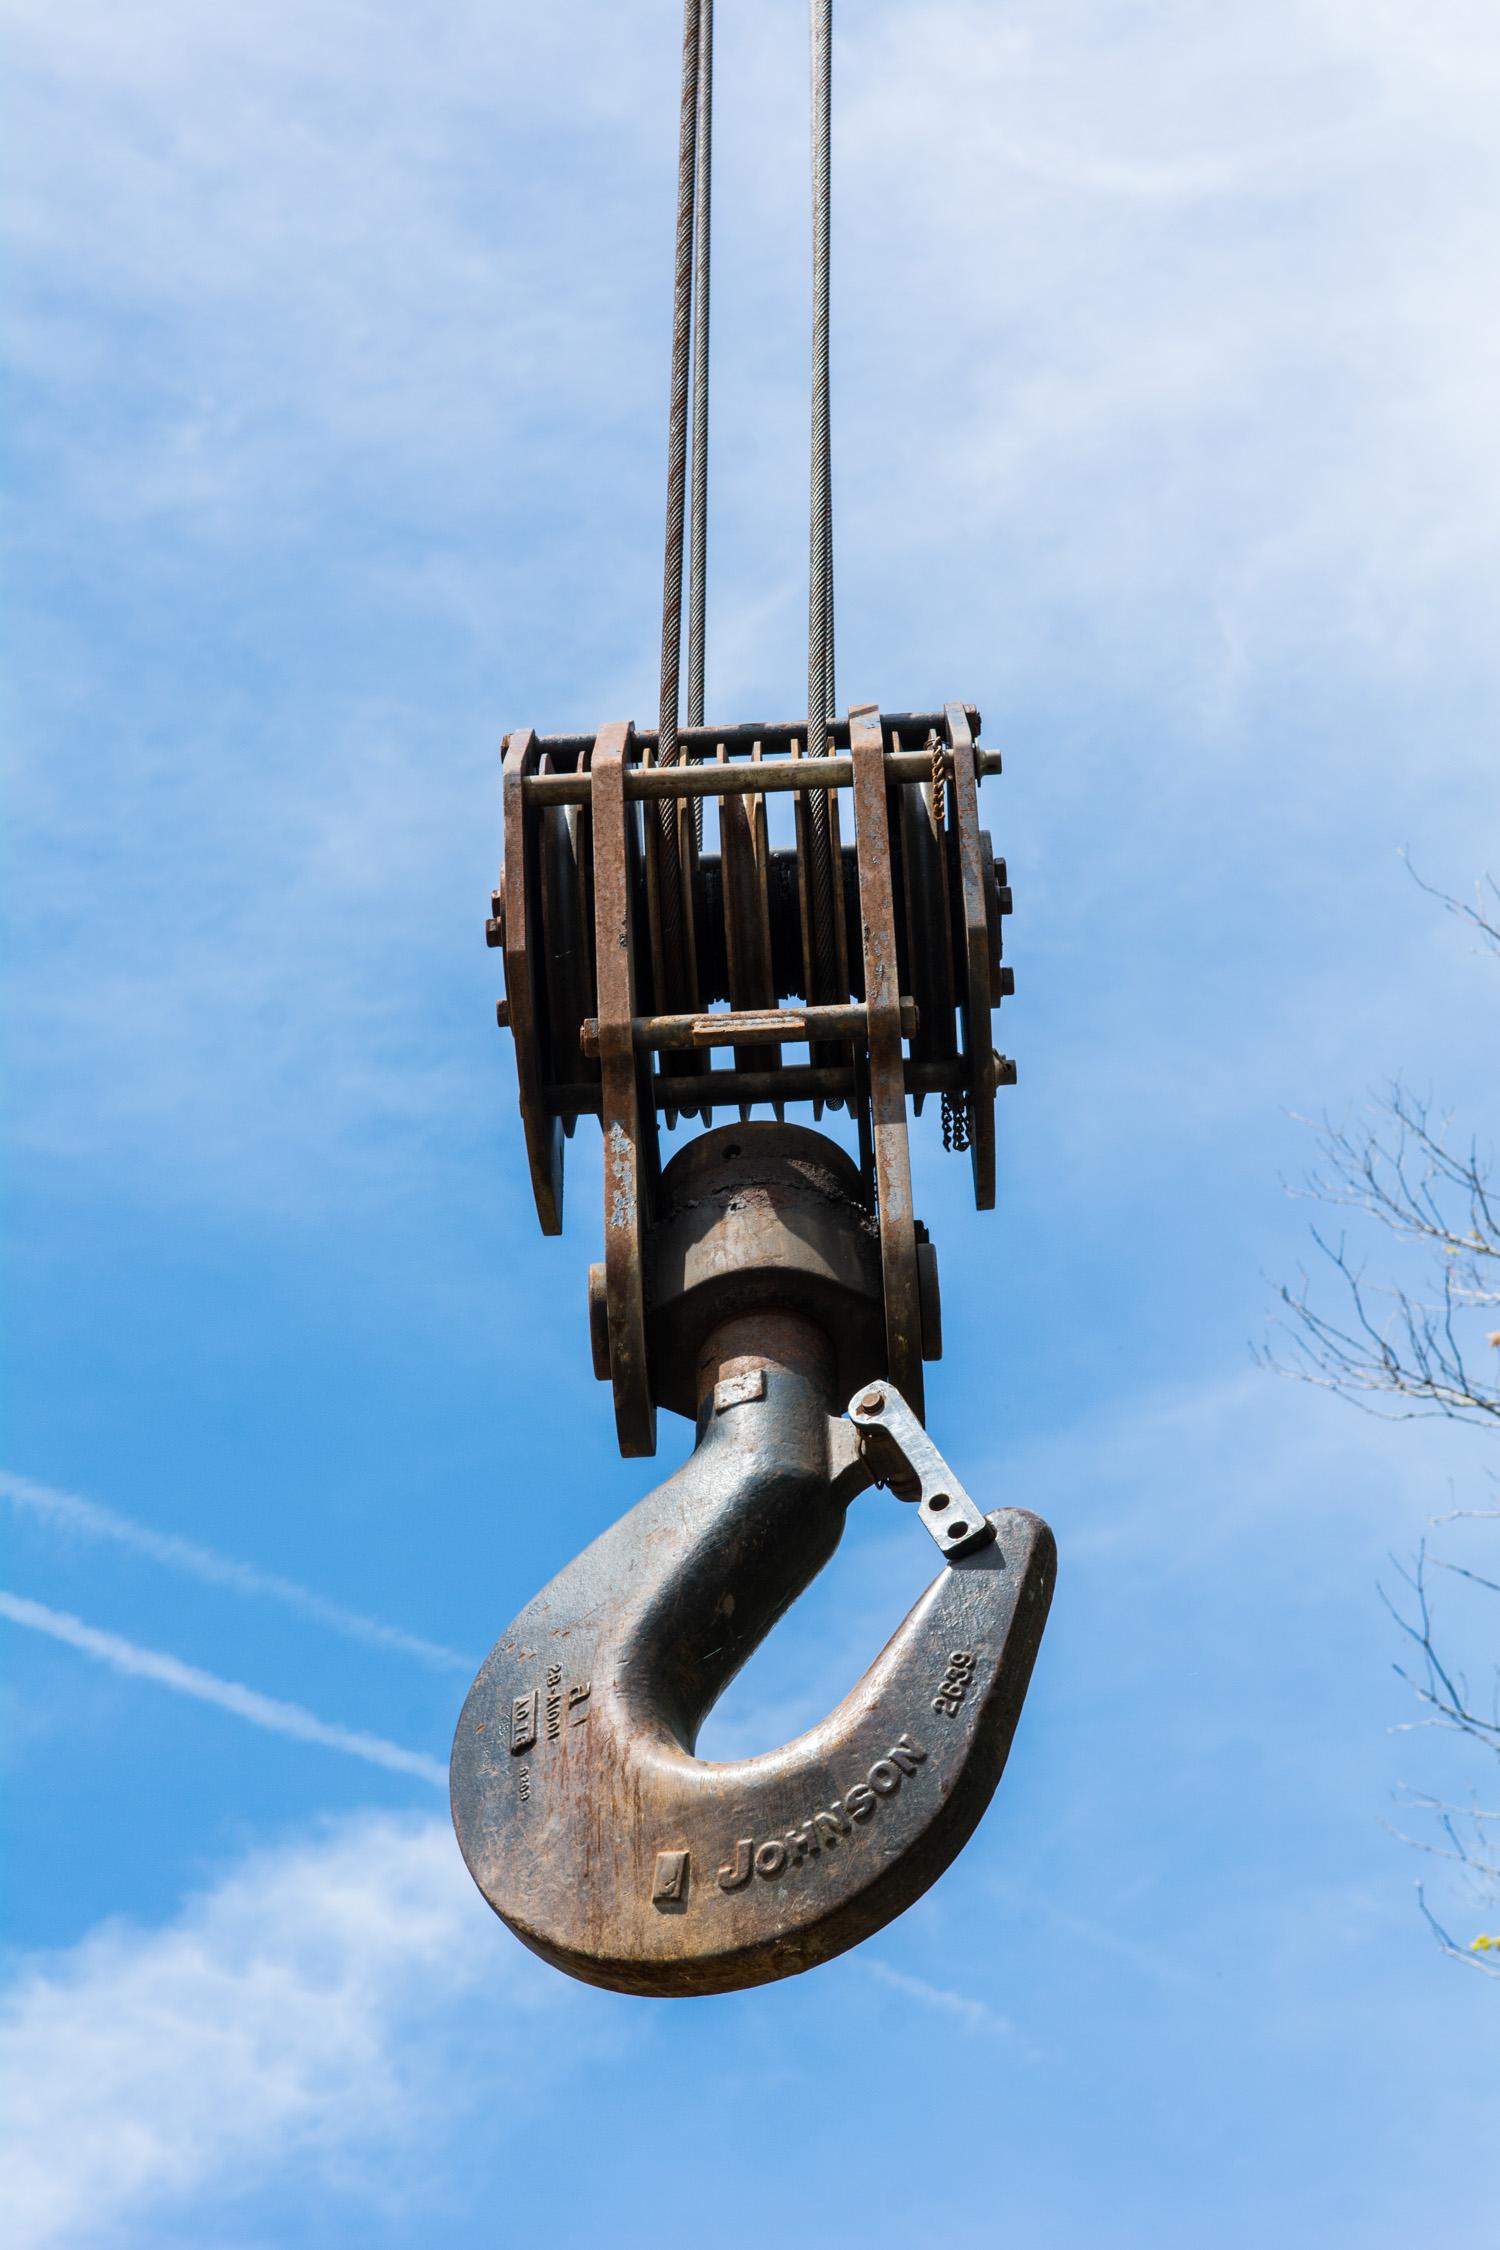 june09 2014-A. W. Leil Cranes and Equipment Limited-promo-Antigonish NS-photo by Aaron McKenzie Fraser-www.amfraser.com-7392.jpg